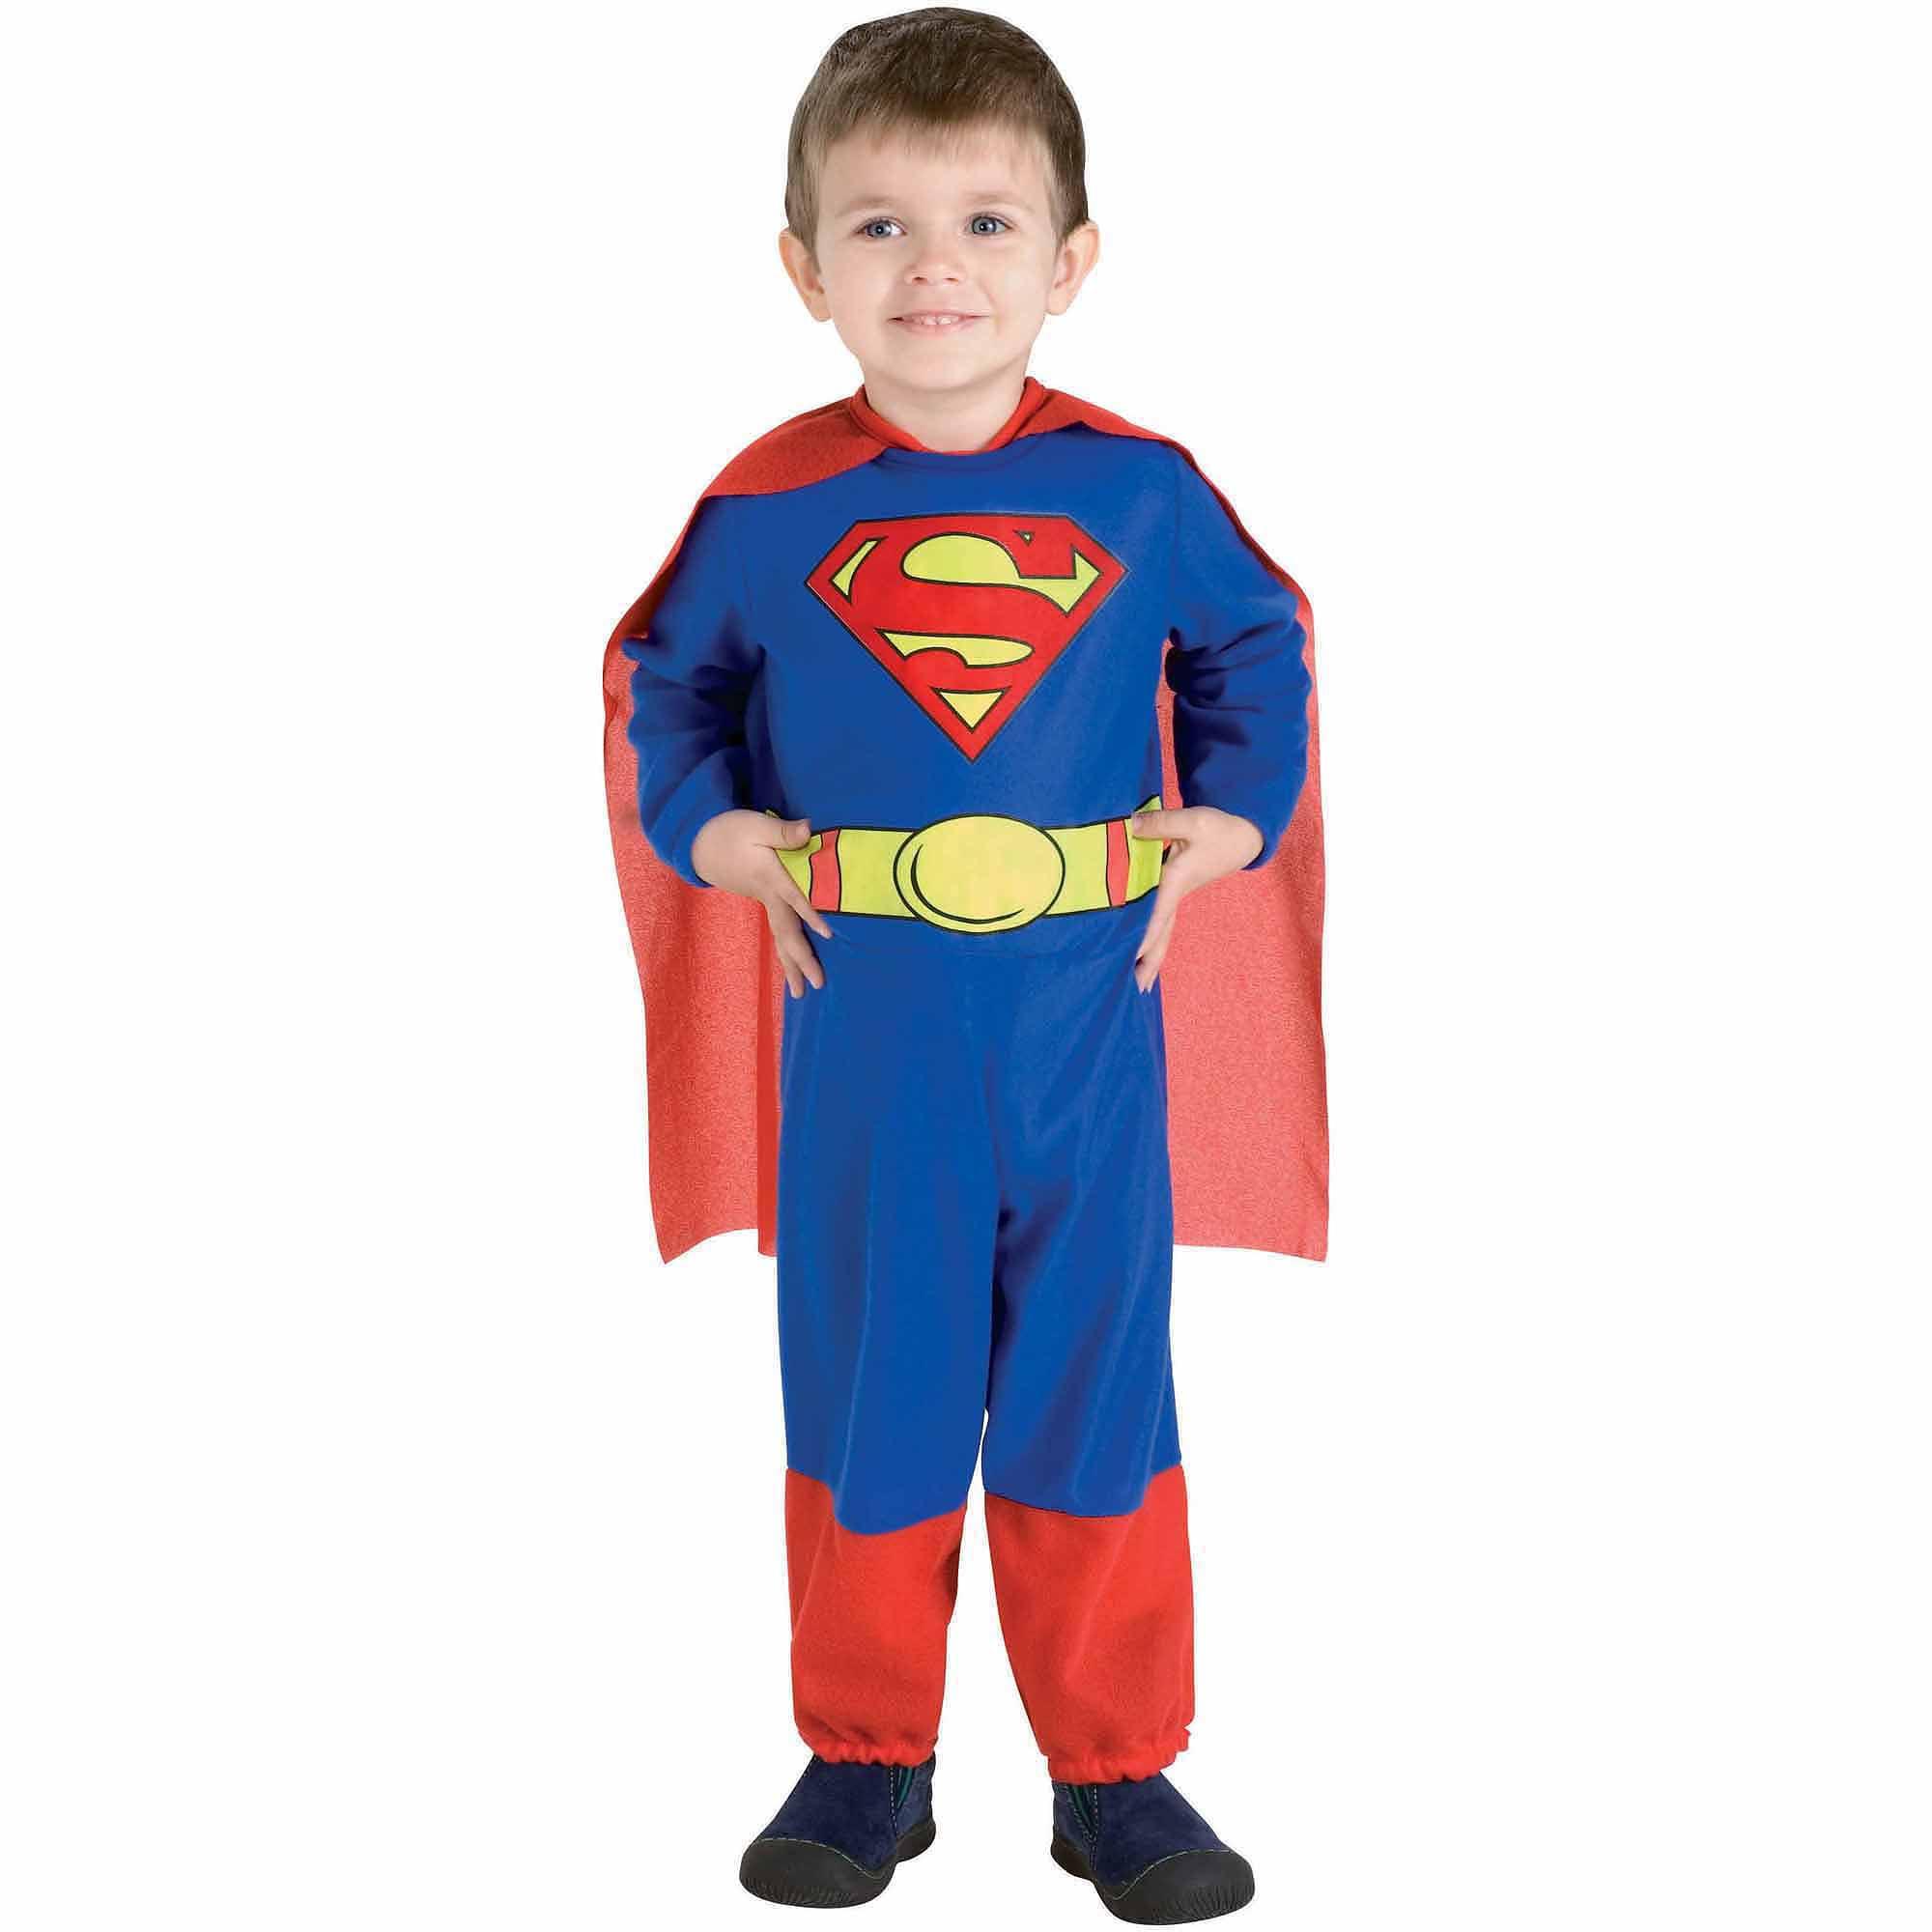 sc 1 st  Walmart & Superman Toddler Halloween Costume Size 3T-4T - Walmart.com